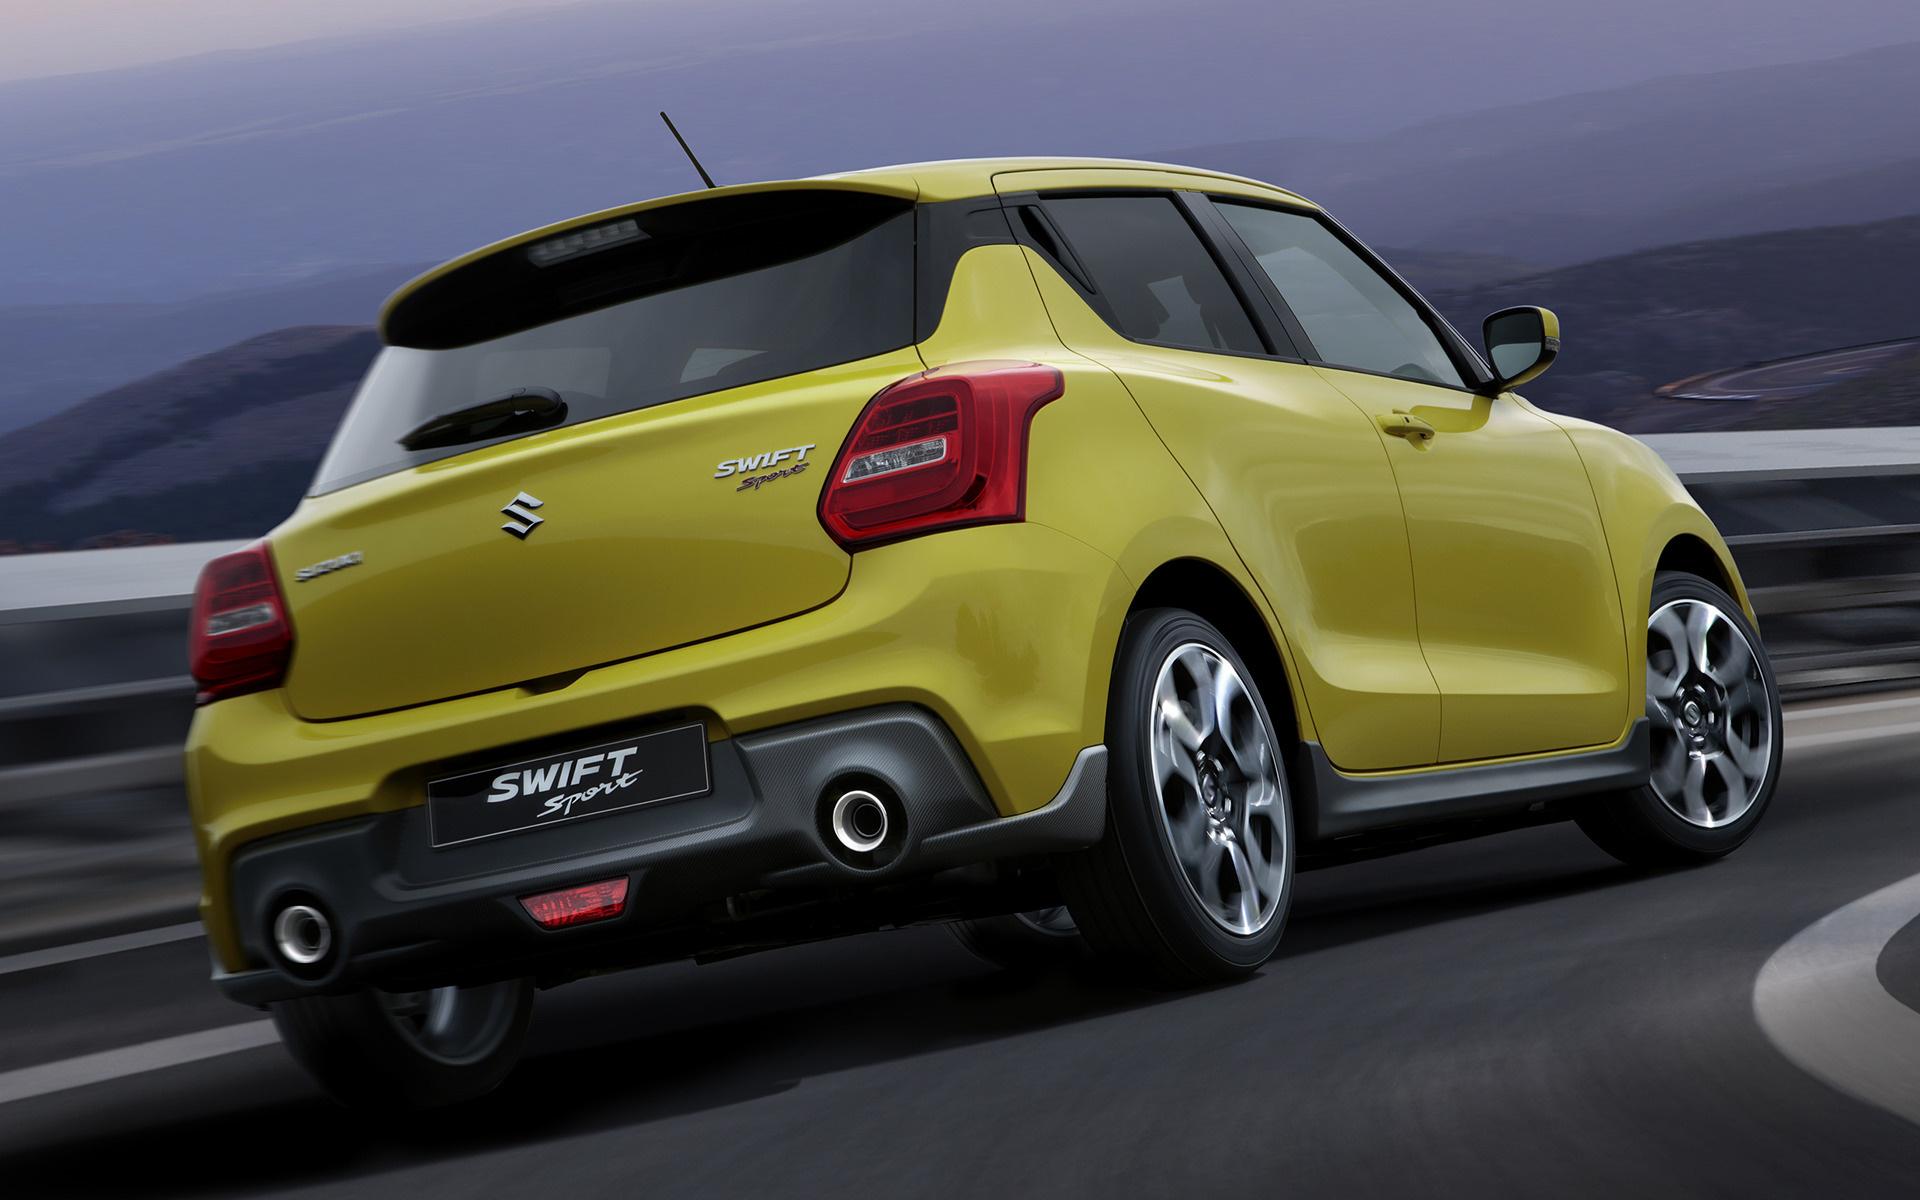 2018 Suzuki Swift Sport Fondos De Pantalla E Imágenes En